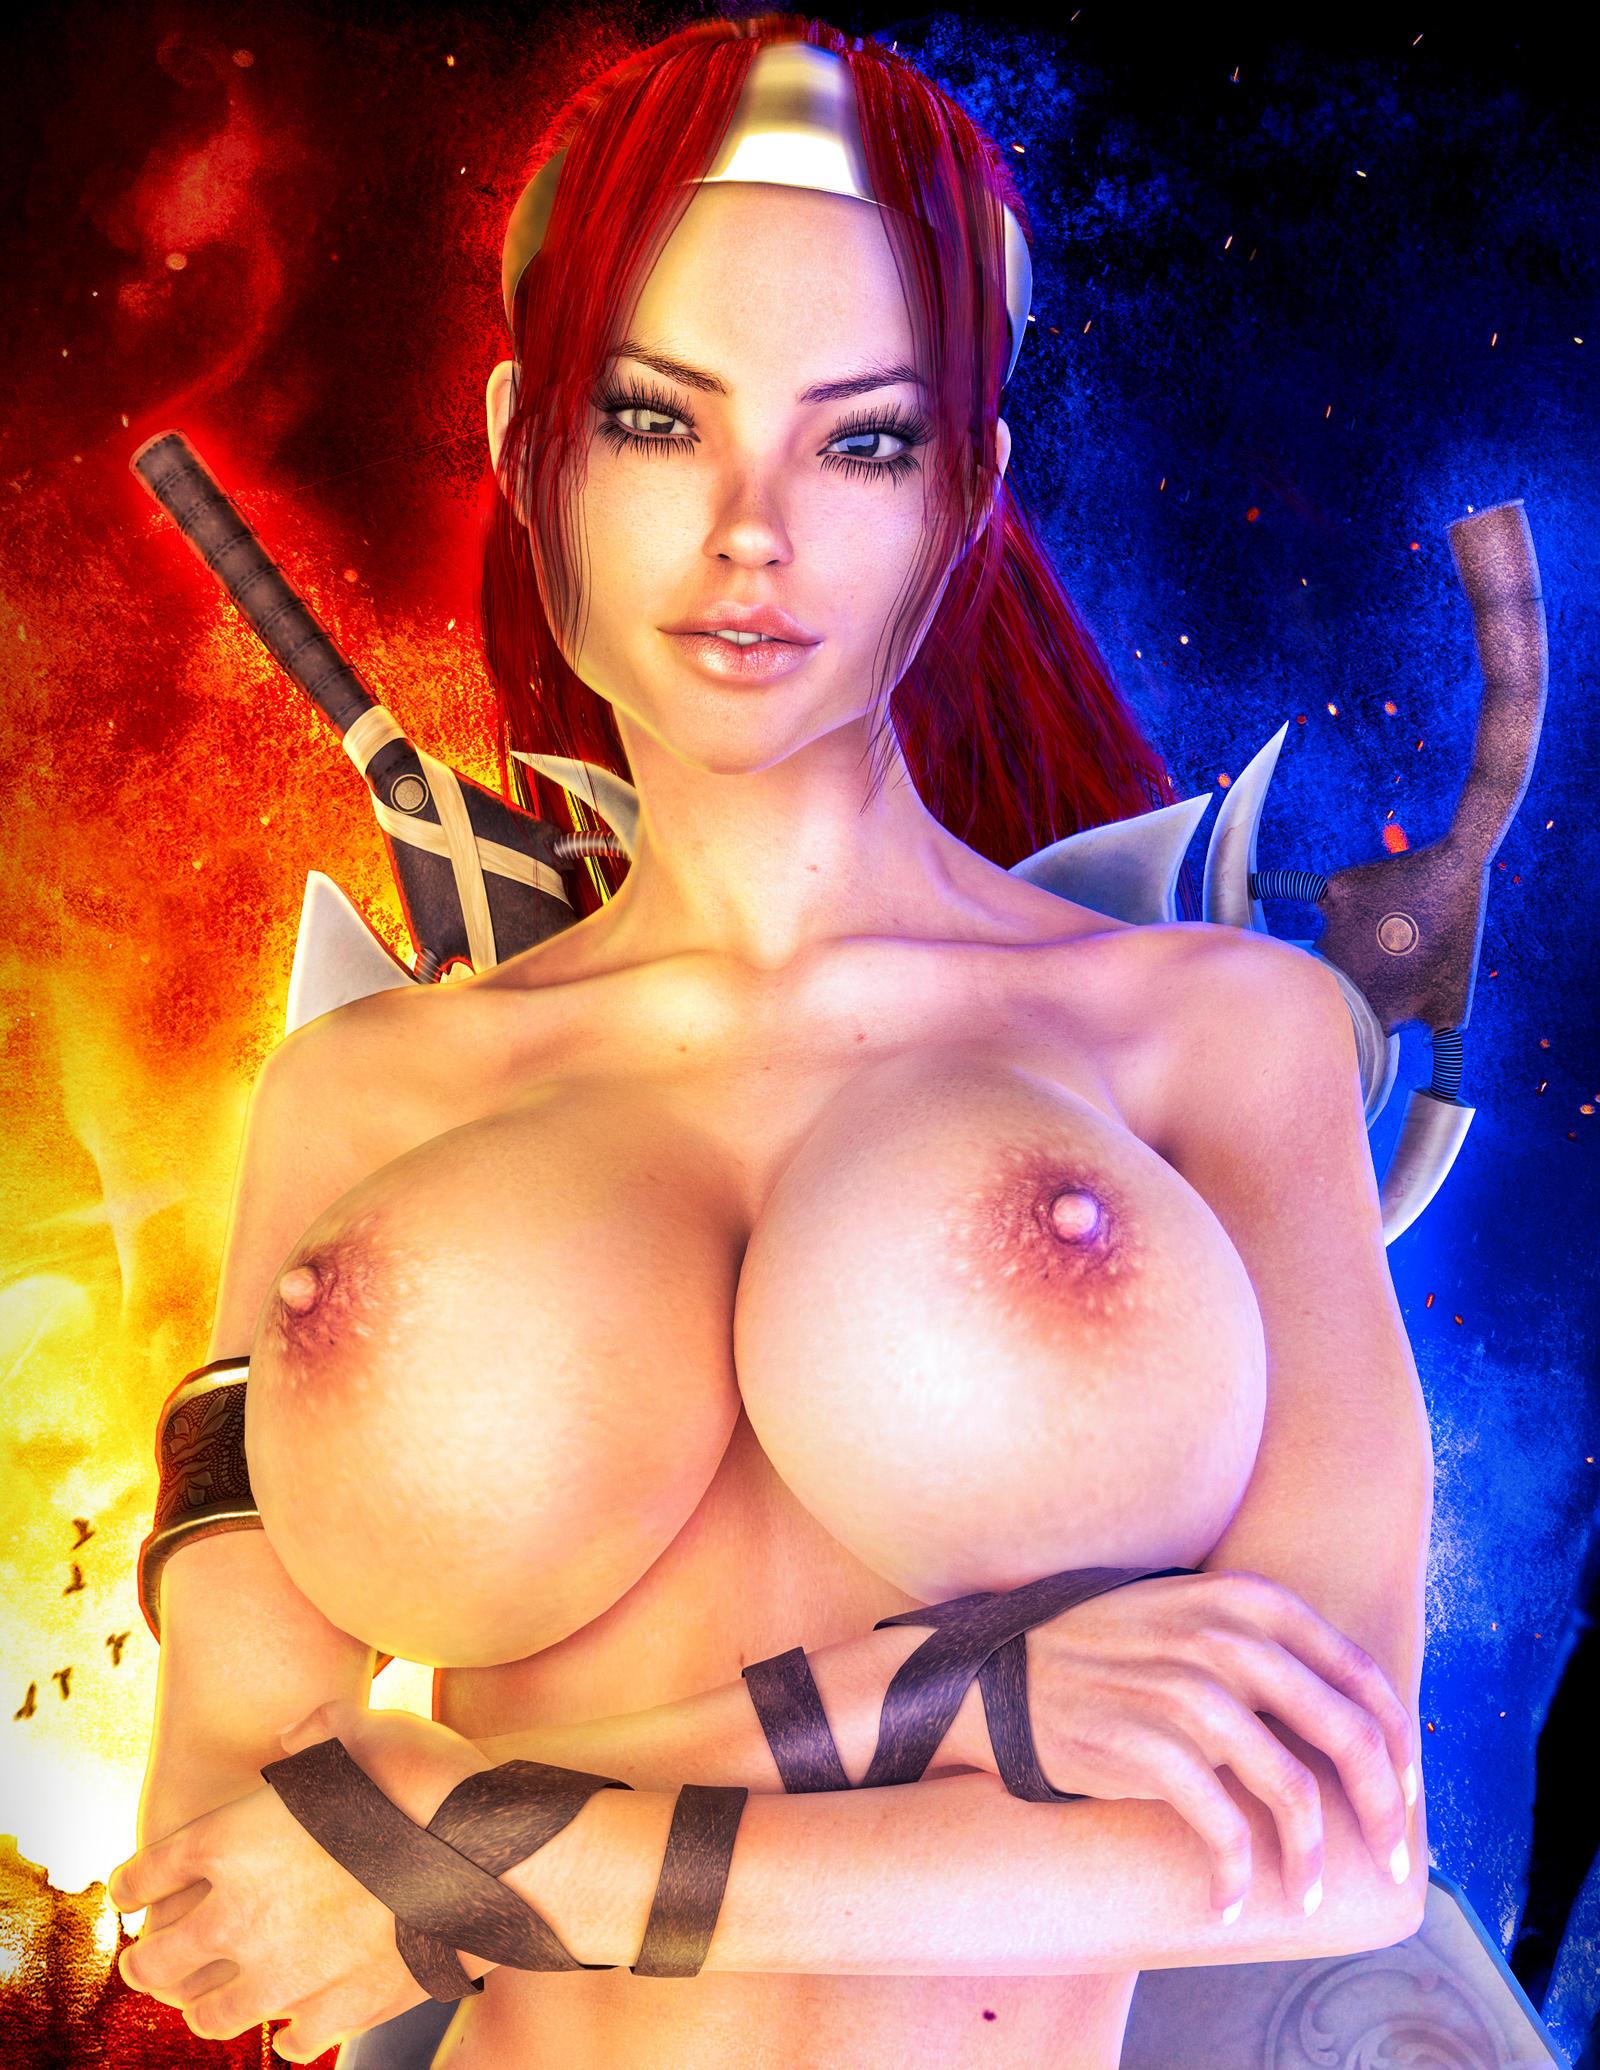 Consider, that Girl from heavenly sword naked